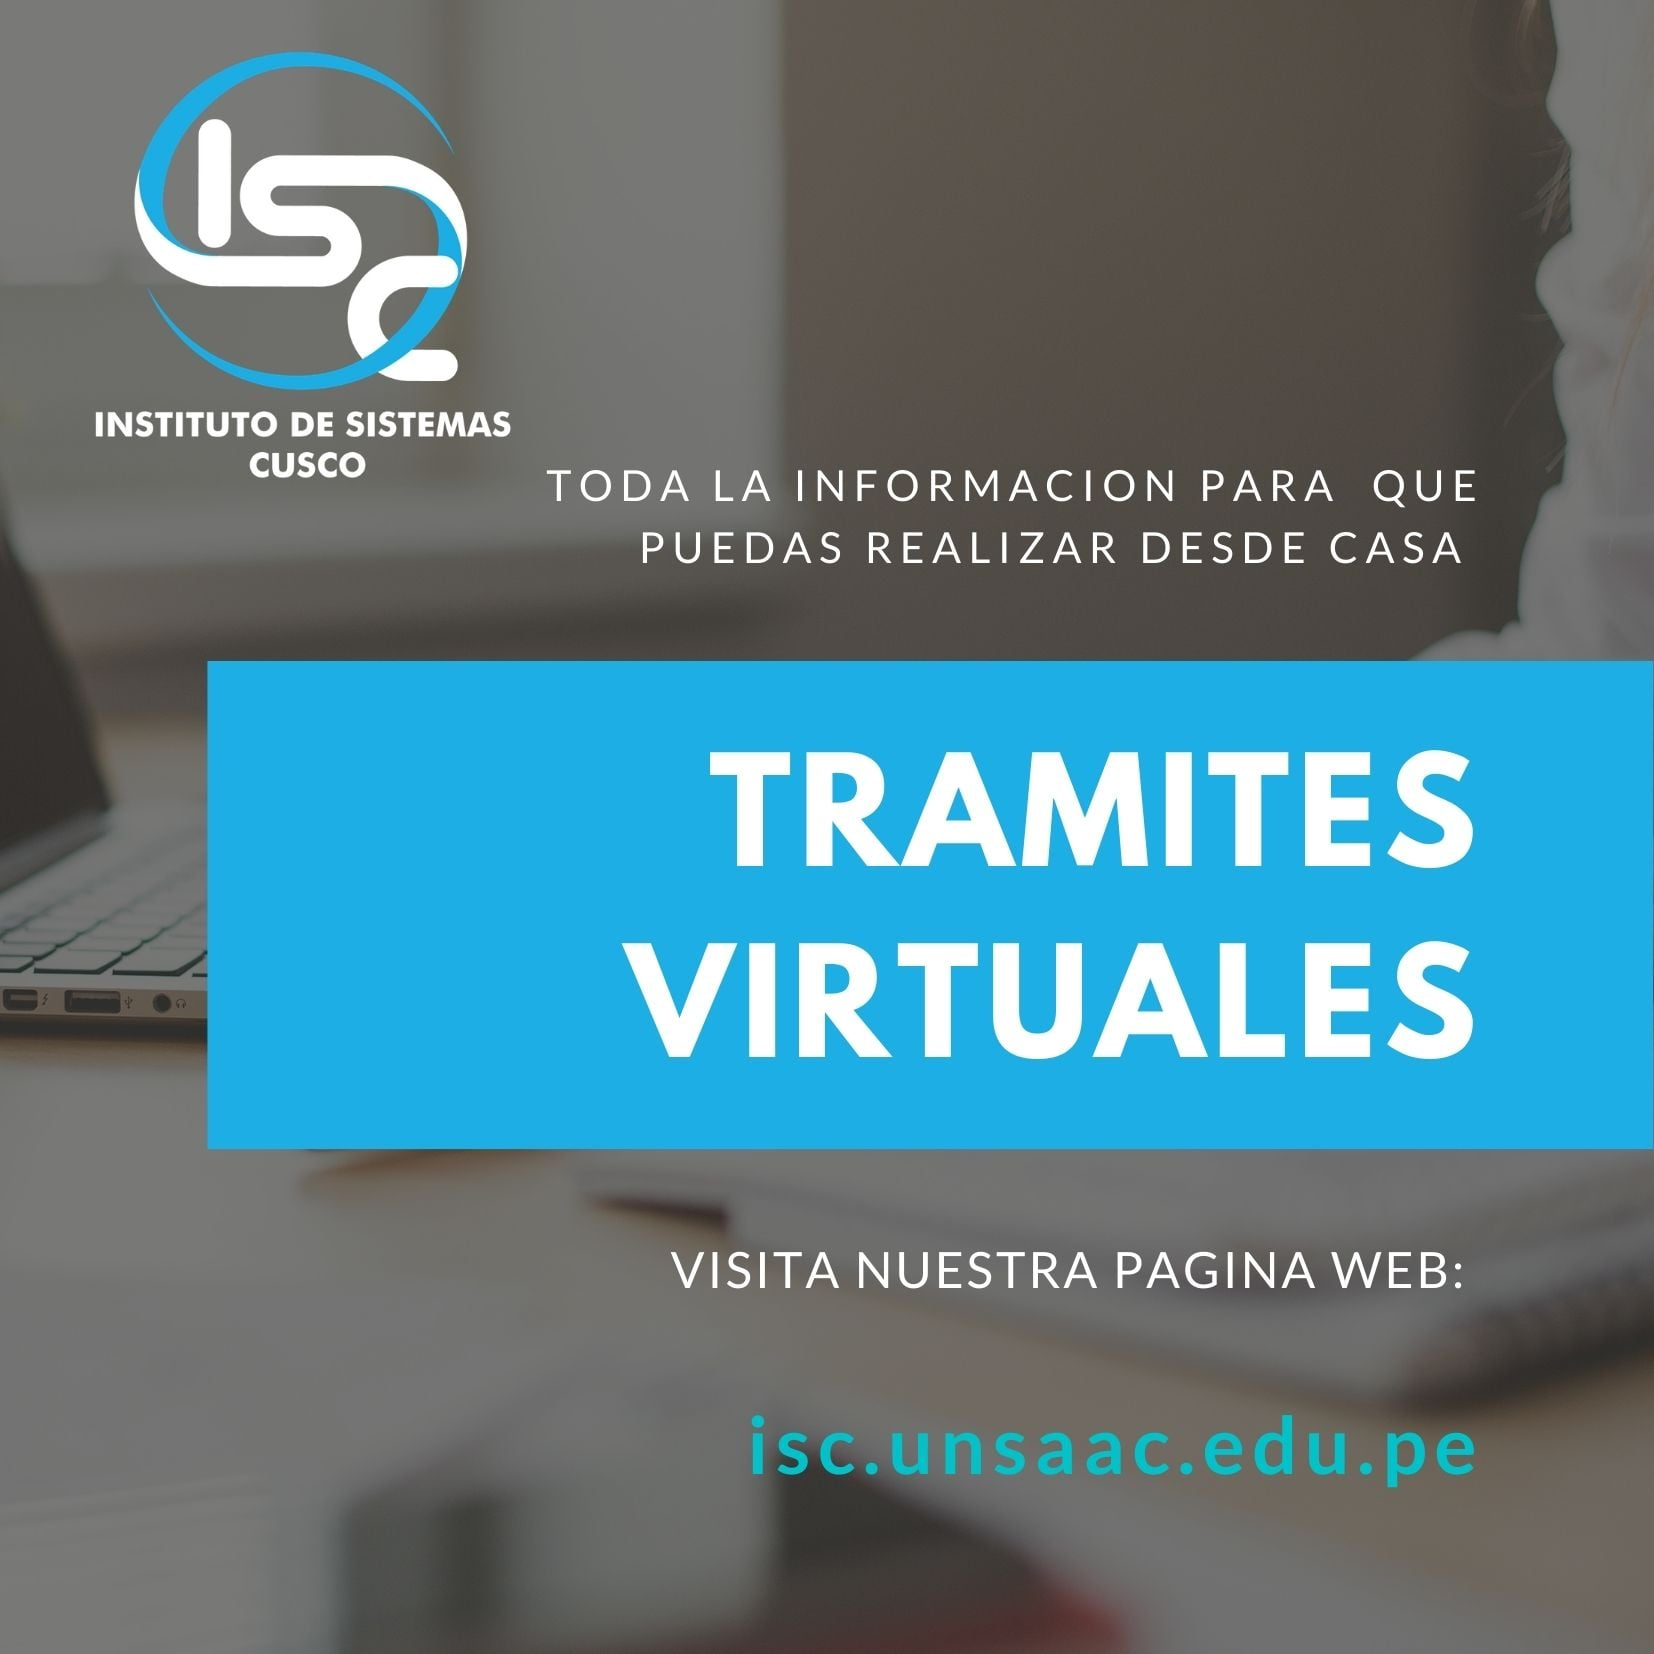 TRÁMITES VIRTUALES